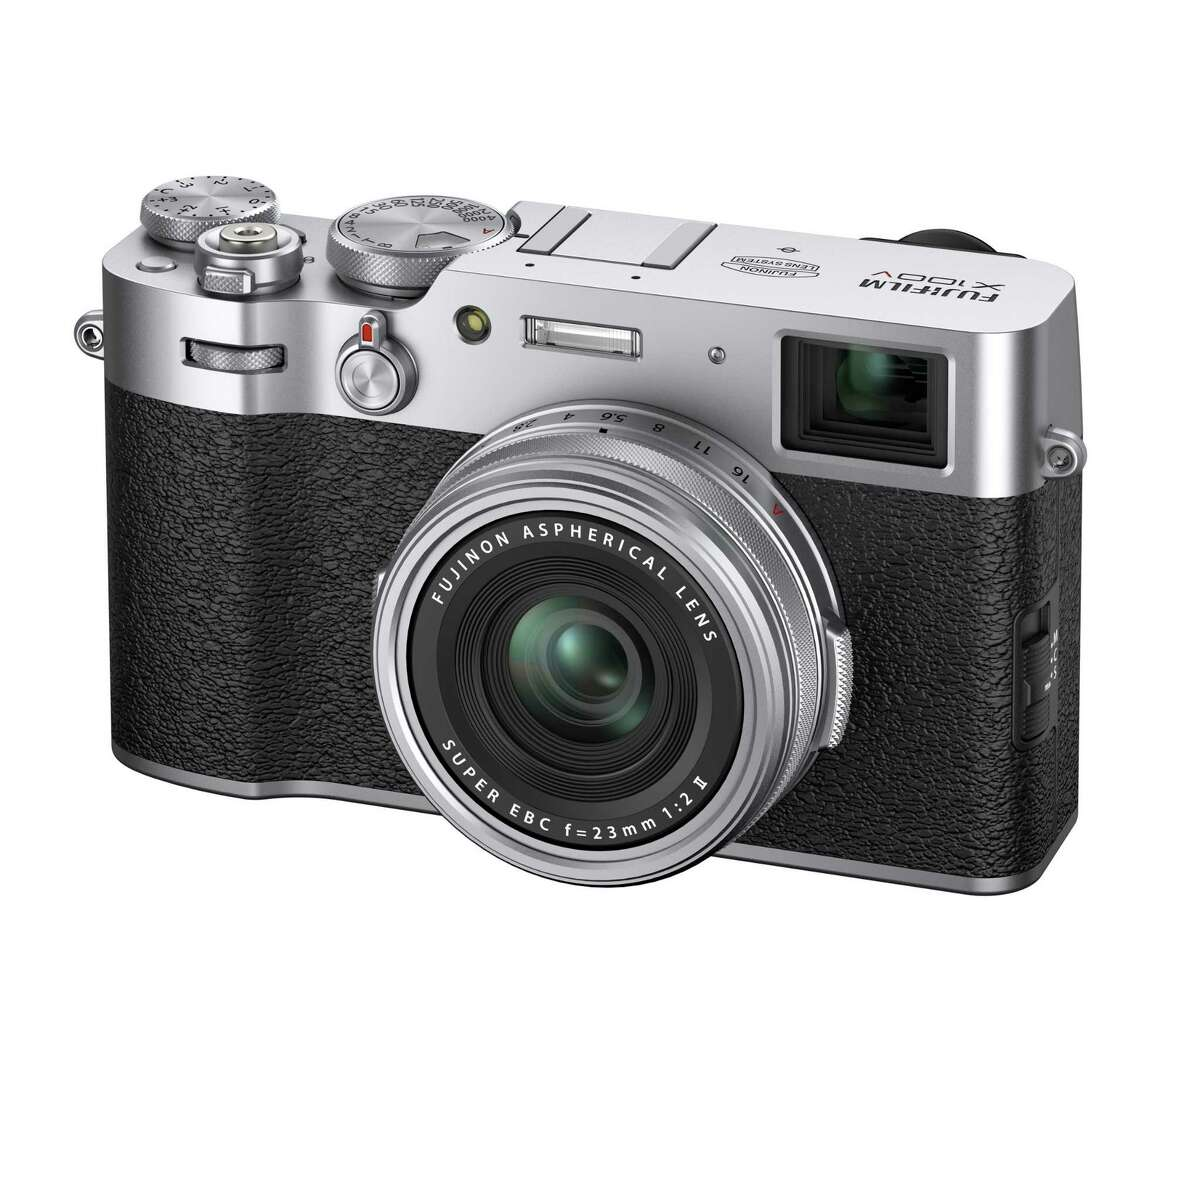 Fuji X100V camera; $1,399 at Houston Camera Exchange